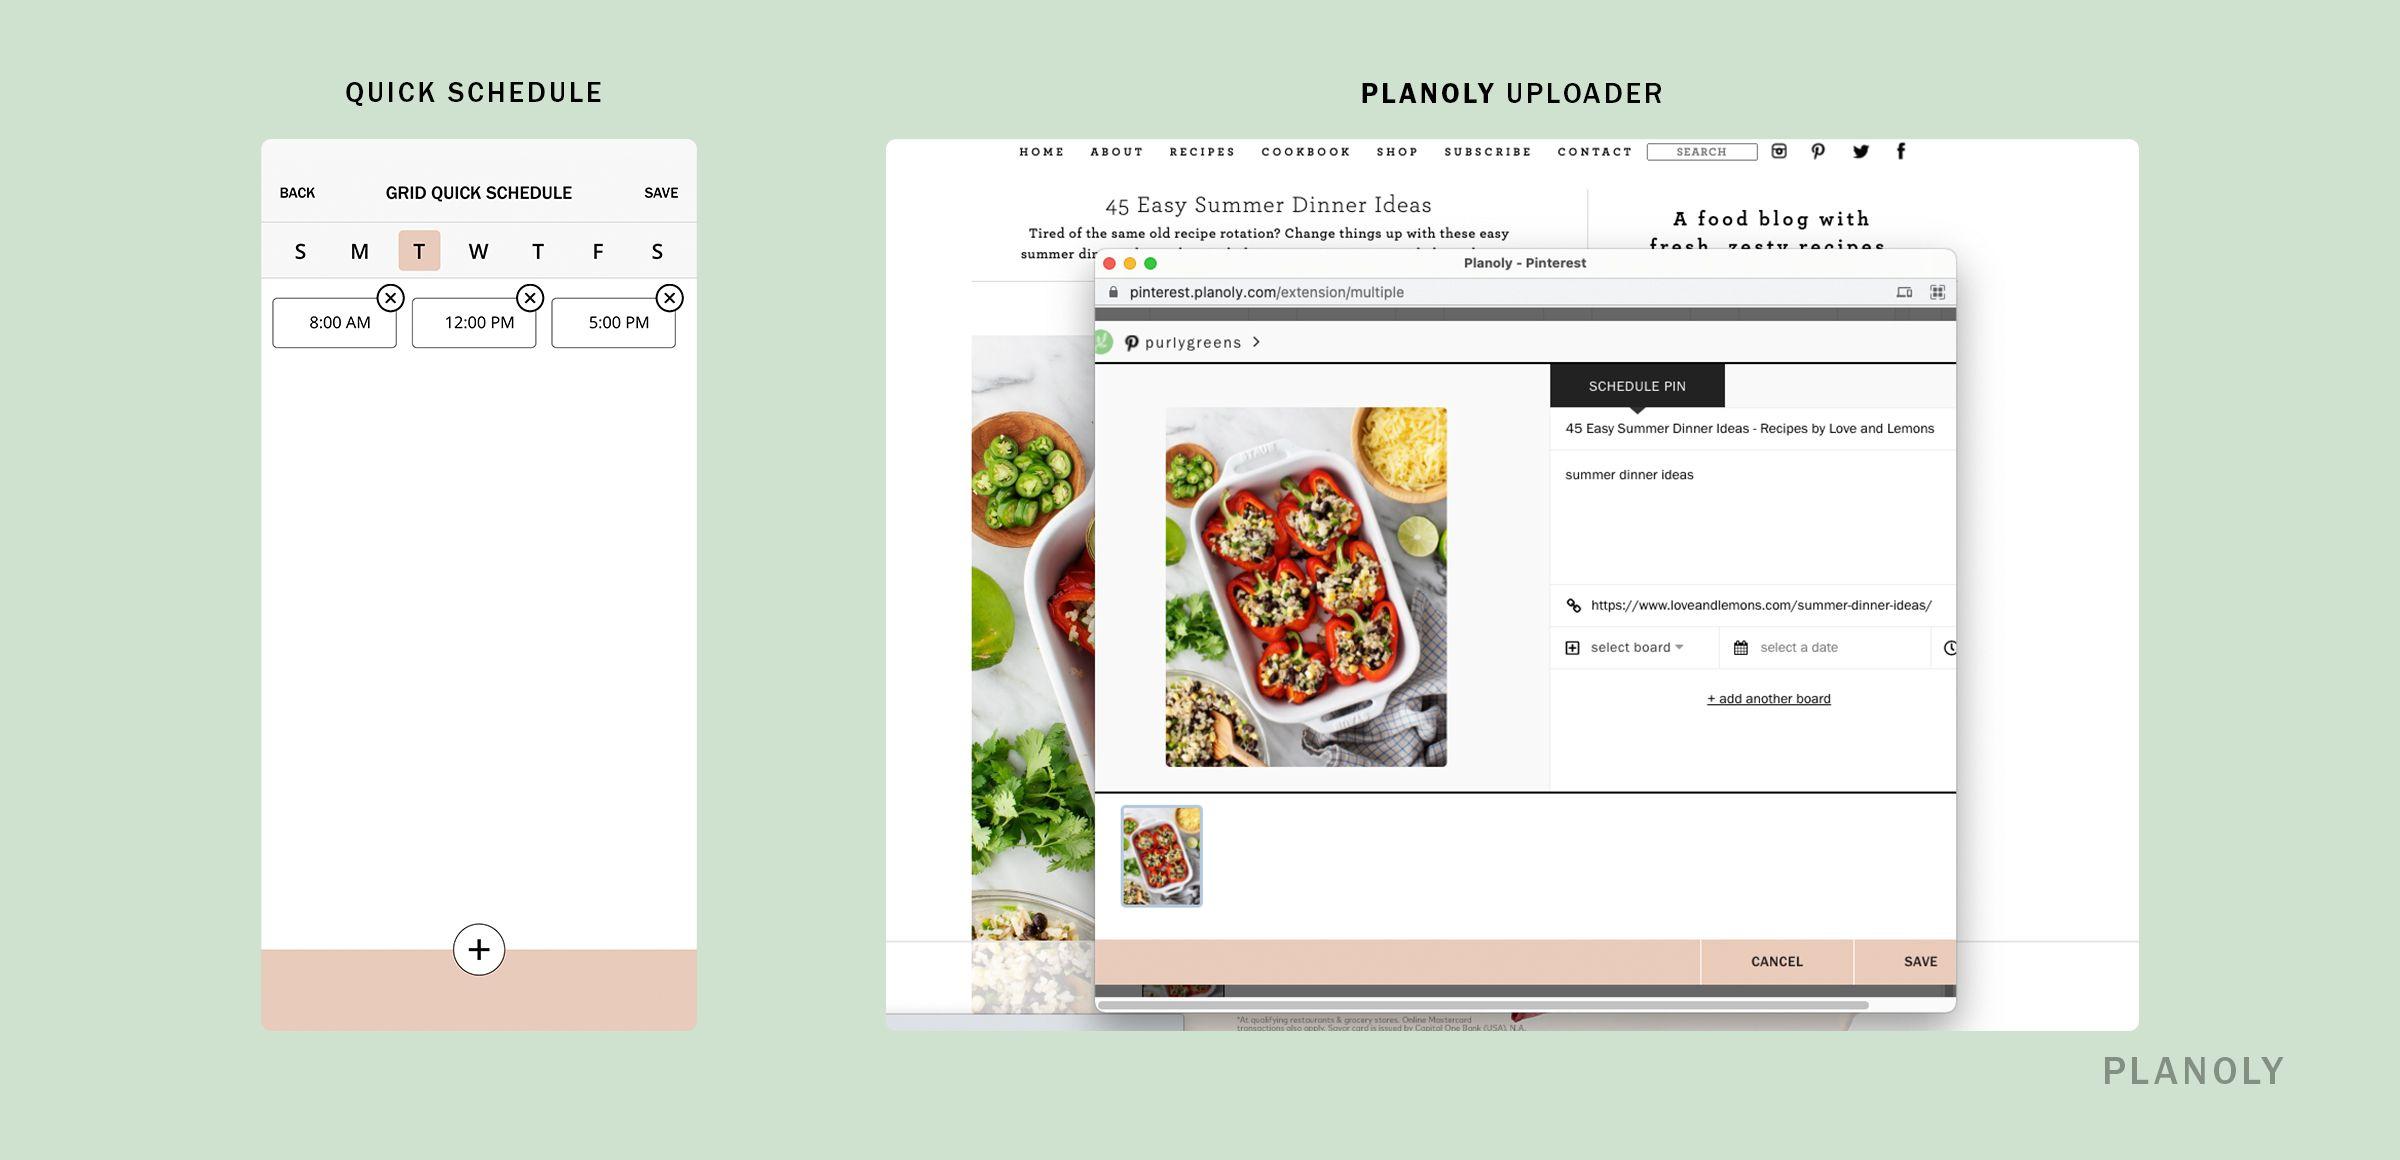 PLANOLY - Blog Post - Pinterest for Business - Image 4-3